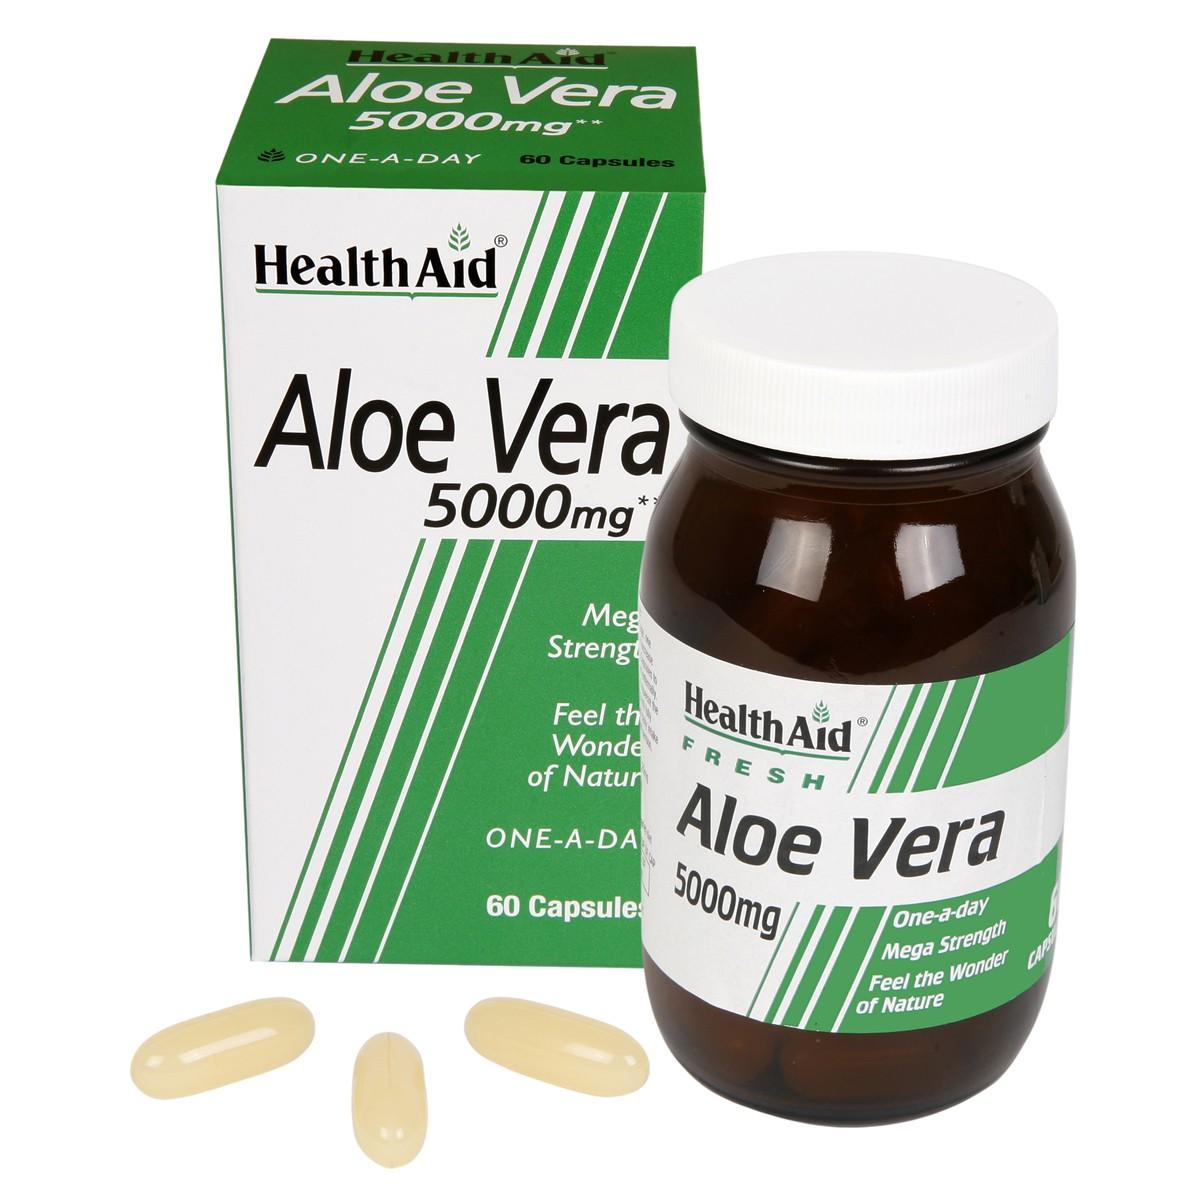 HealthAid Aloe Vera 5000mg